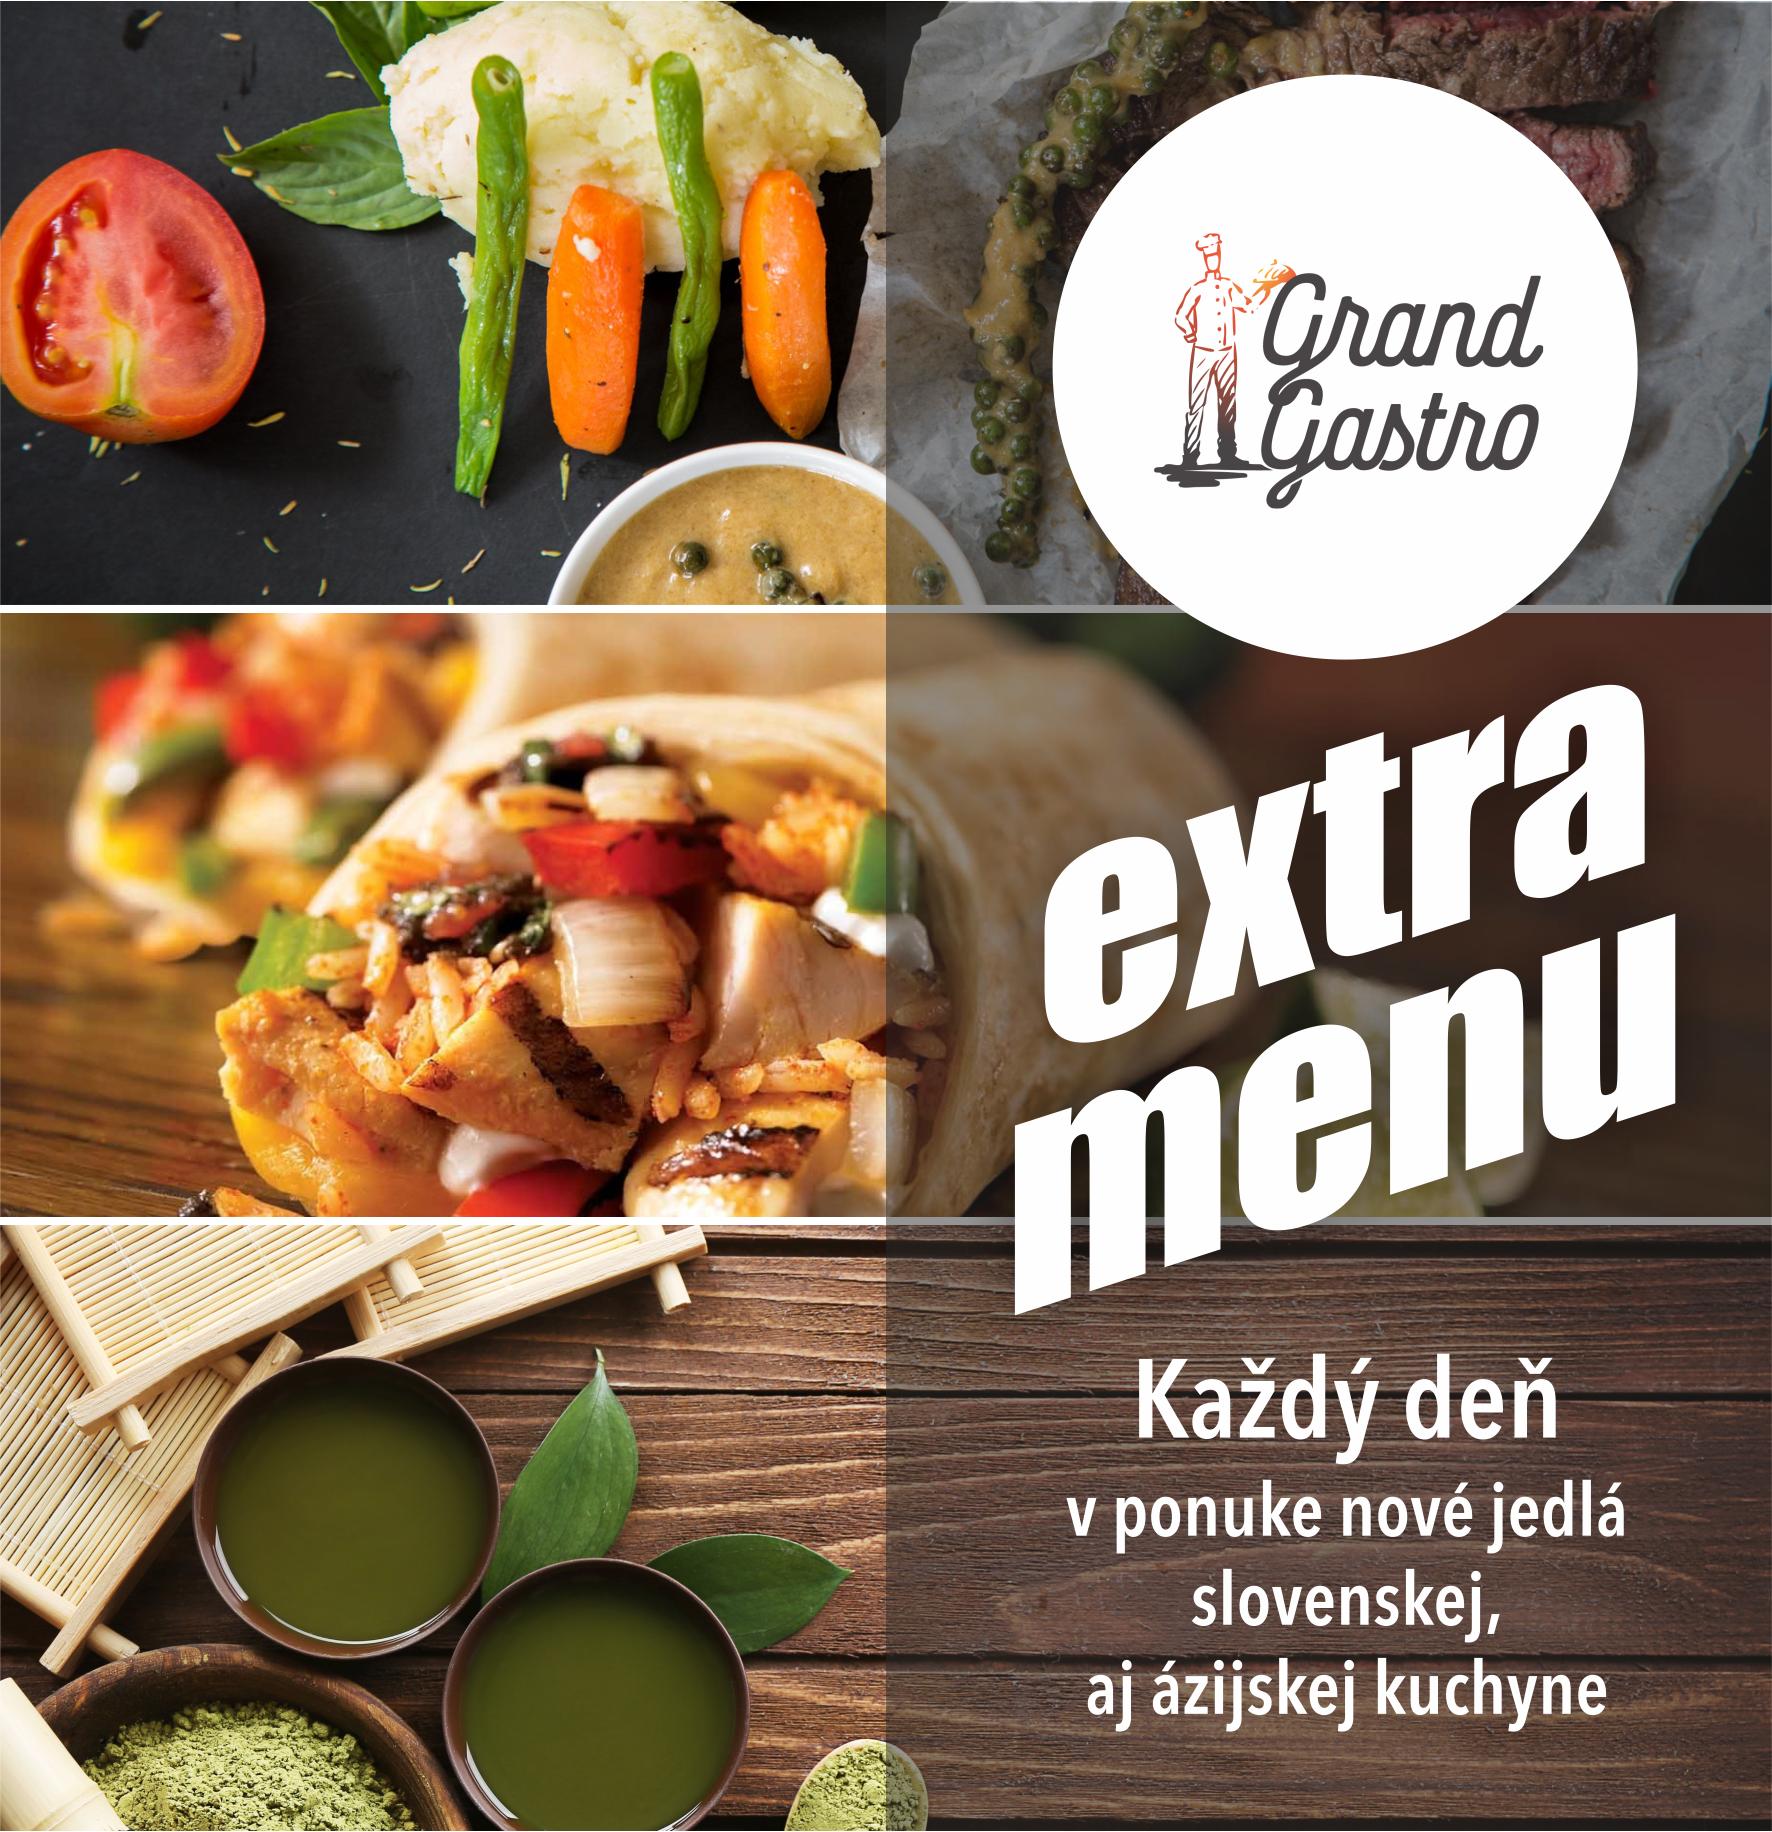 Naša ponuka extra menu